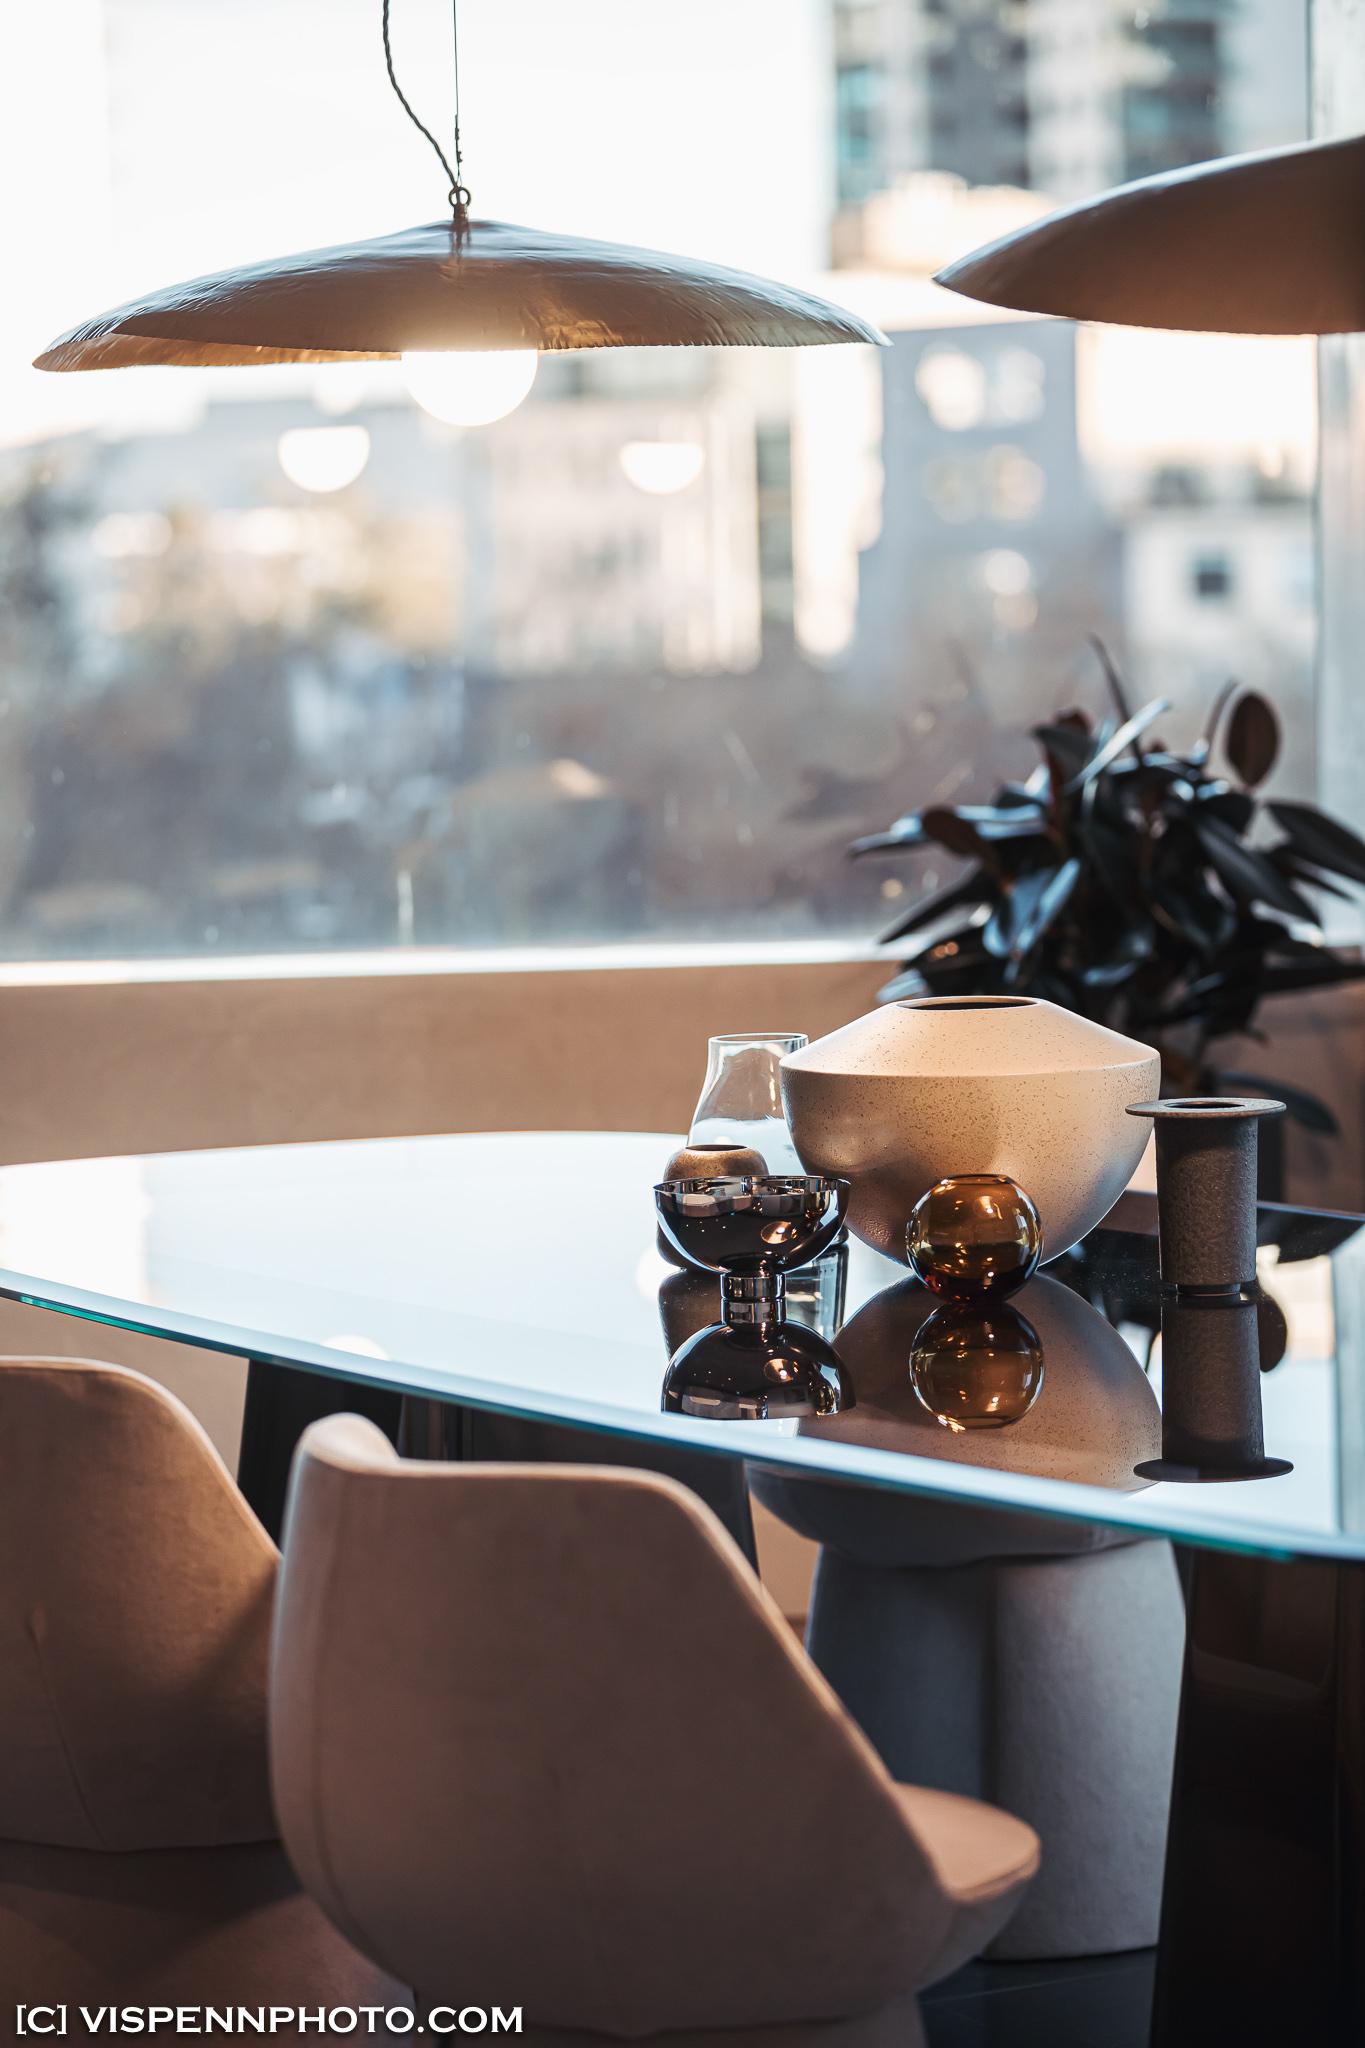 REAL ESTATE INTERIOR Photography Melbourne VISPENN 墨尔本 地产摄影 公寓拍摄 豪宅拍摄 VR远程看房 房产航拍 5D5 6372